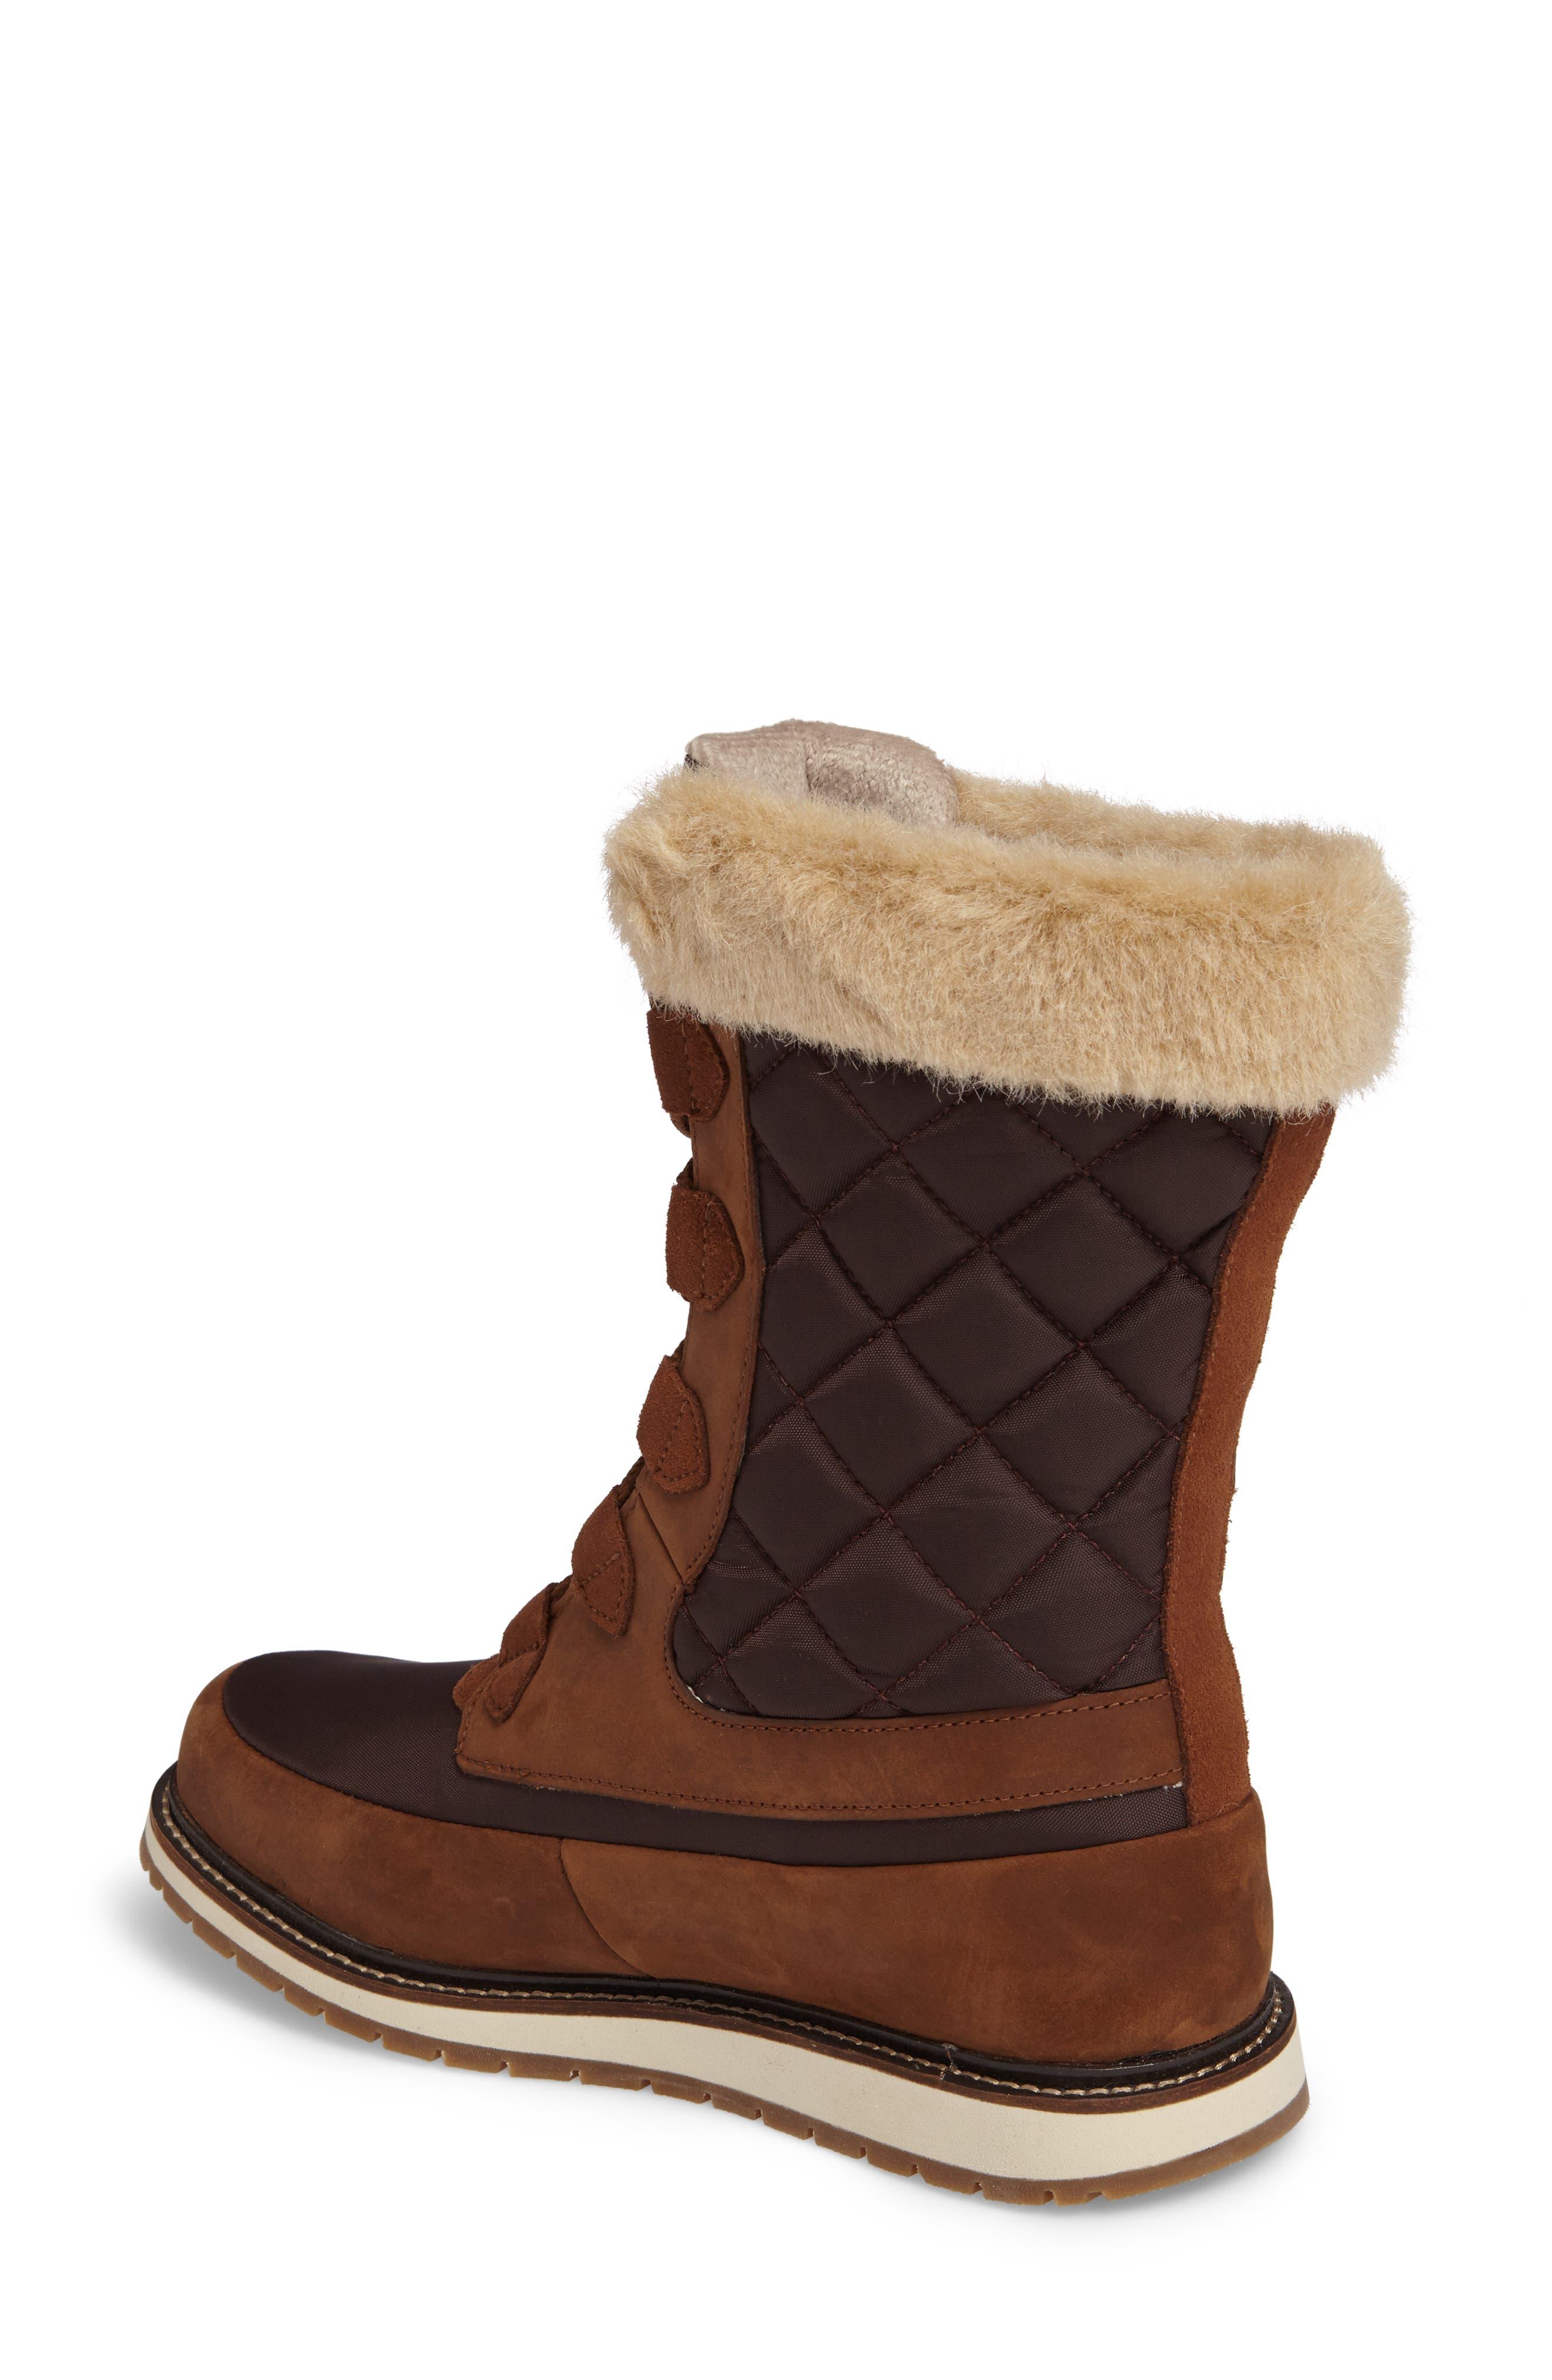 Alternate Image 2  - Helly Hansen Arosa Waterproof Boot with Faux Fur Trim (Women)